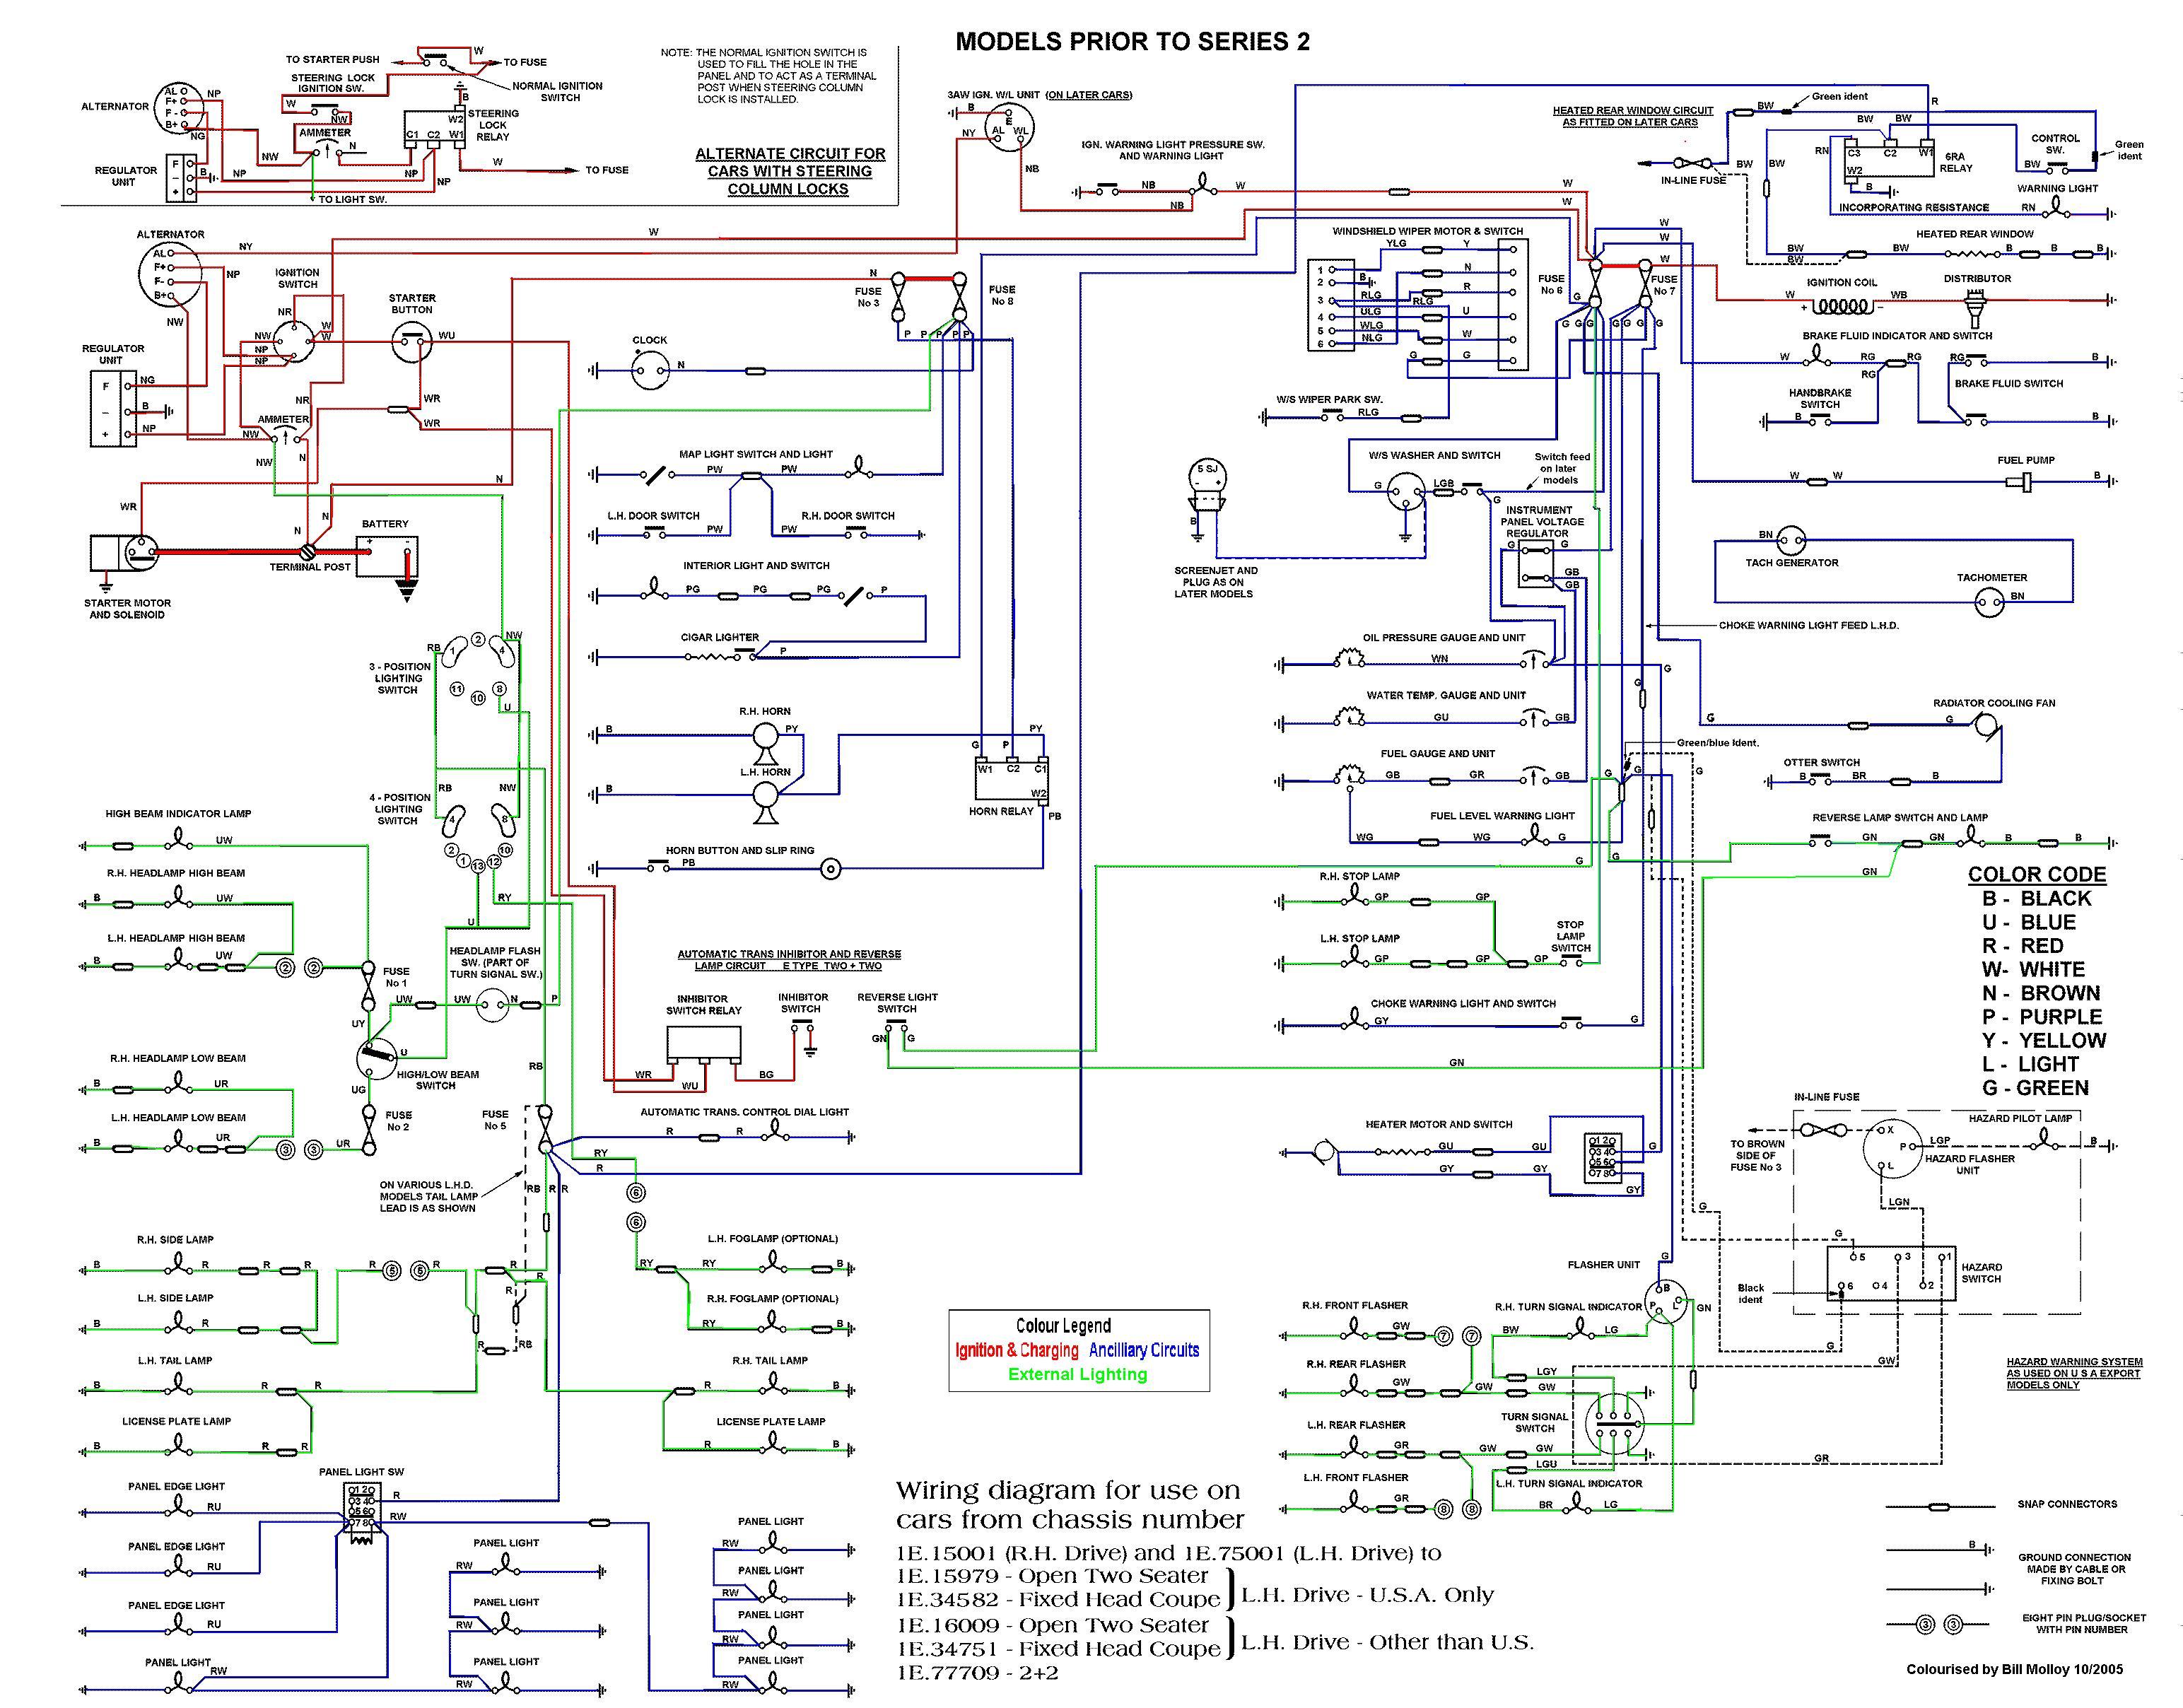 Fine Wiring Diagram Jaguar E Type File Pdf Jaguar Wiring Diagram Download Wiring Cloud Ittabpendurdonanfuldomelitekicepsianuembamohammedshrineorg